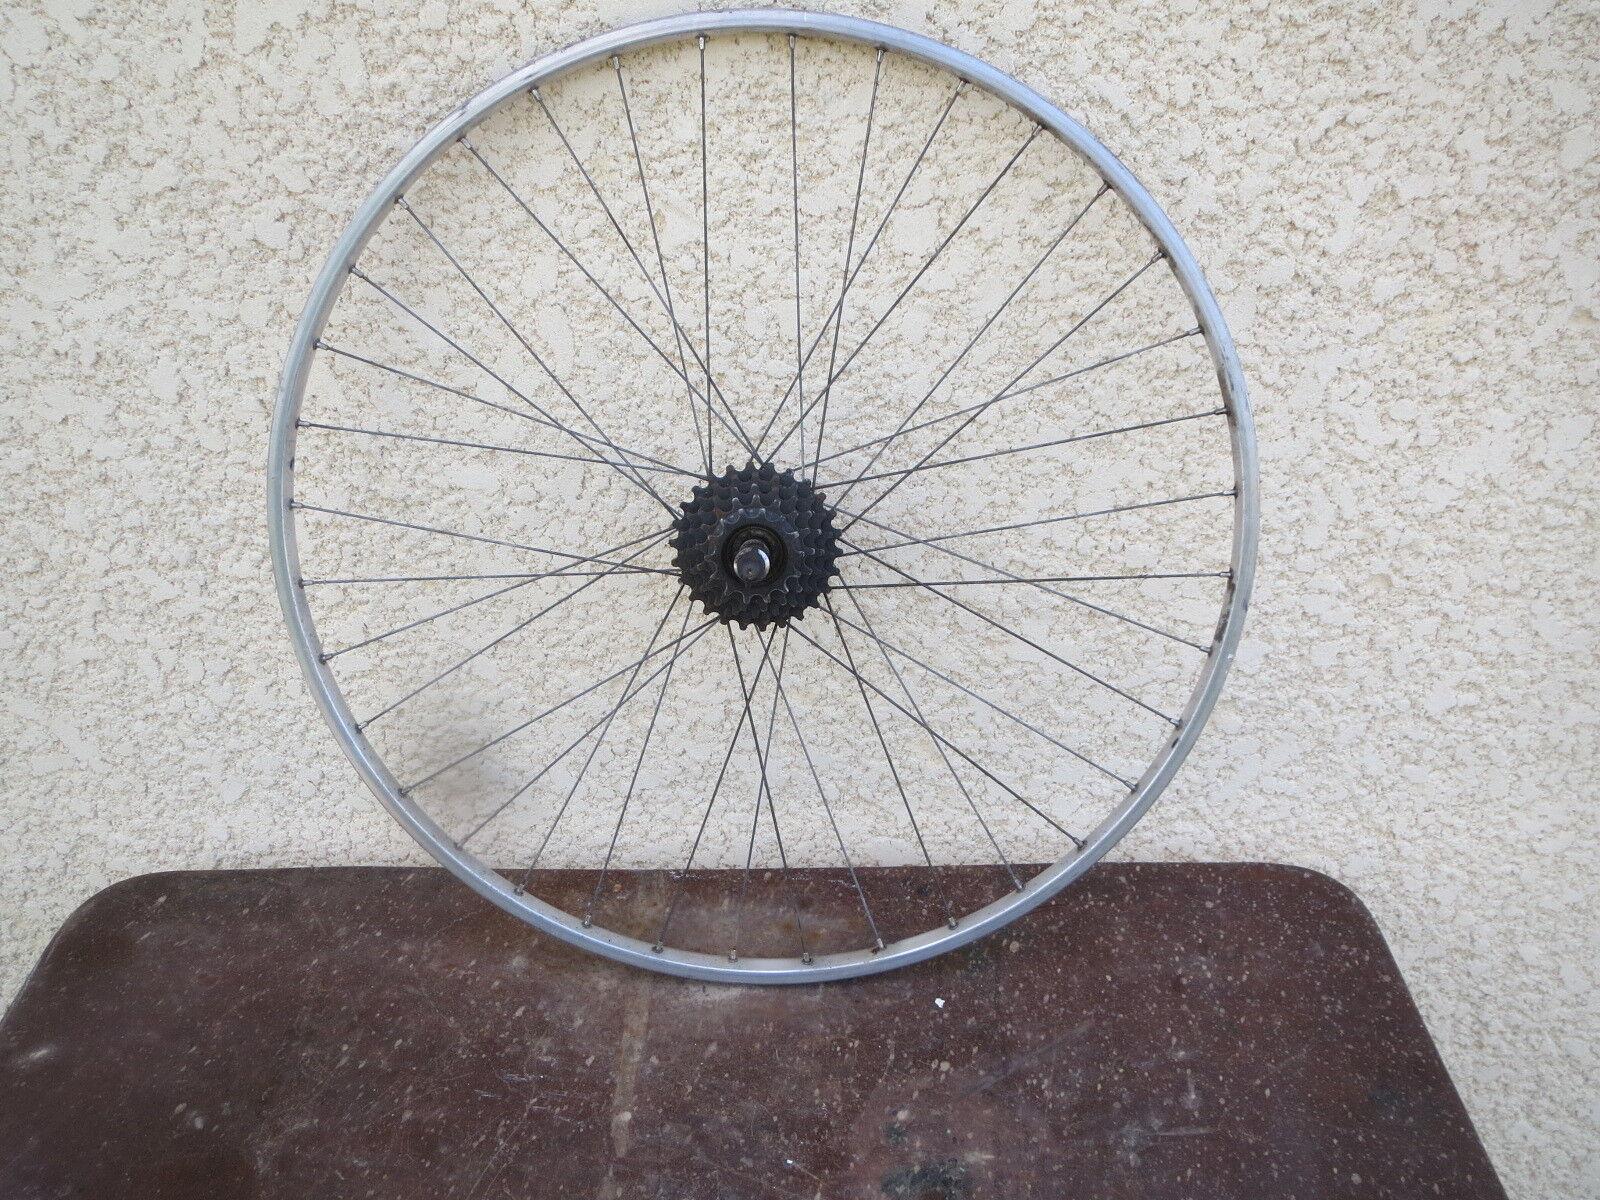 Old Rims aluminum Wheels bike pinion normandy vieux cycle 700   20 C